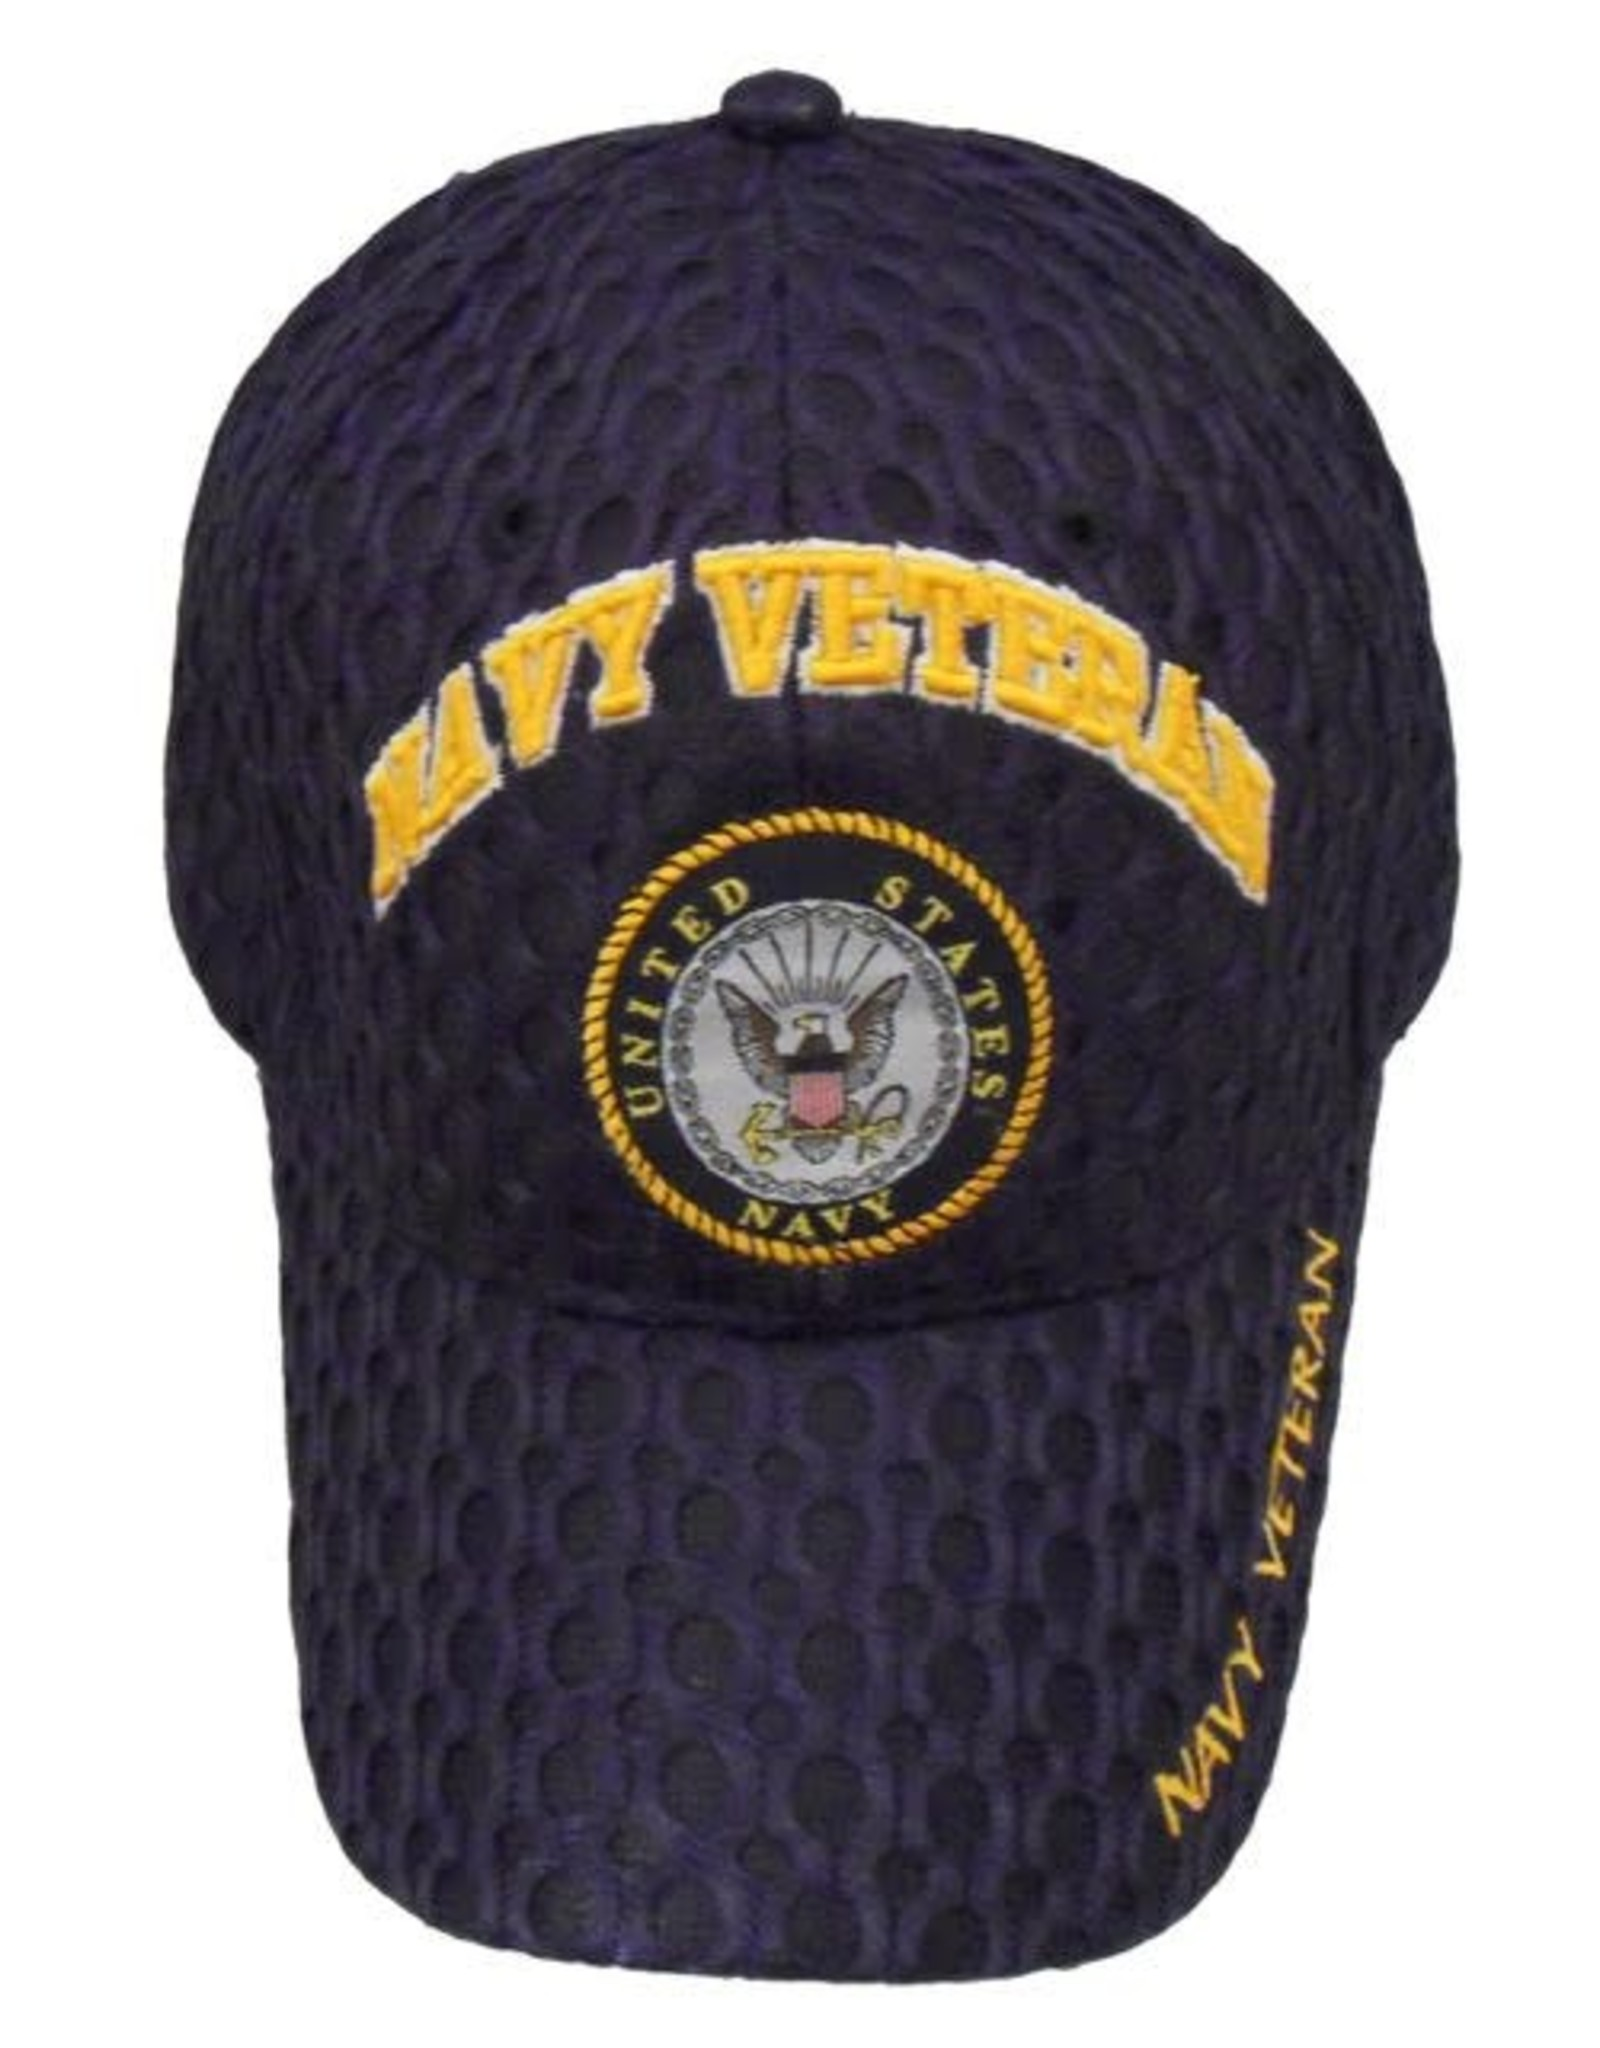 MidMil Navy Veteran Hat with Seal Honeycomb Mesh Dark Blue